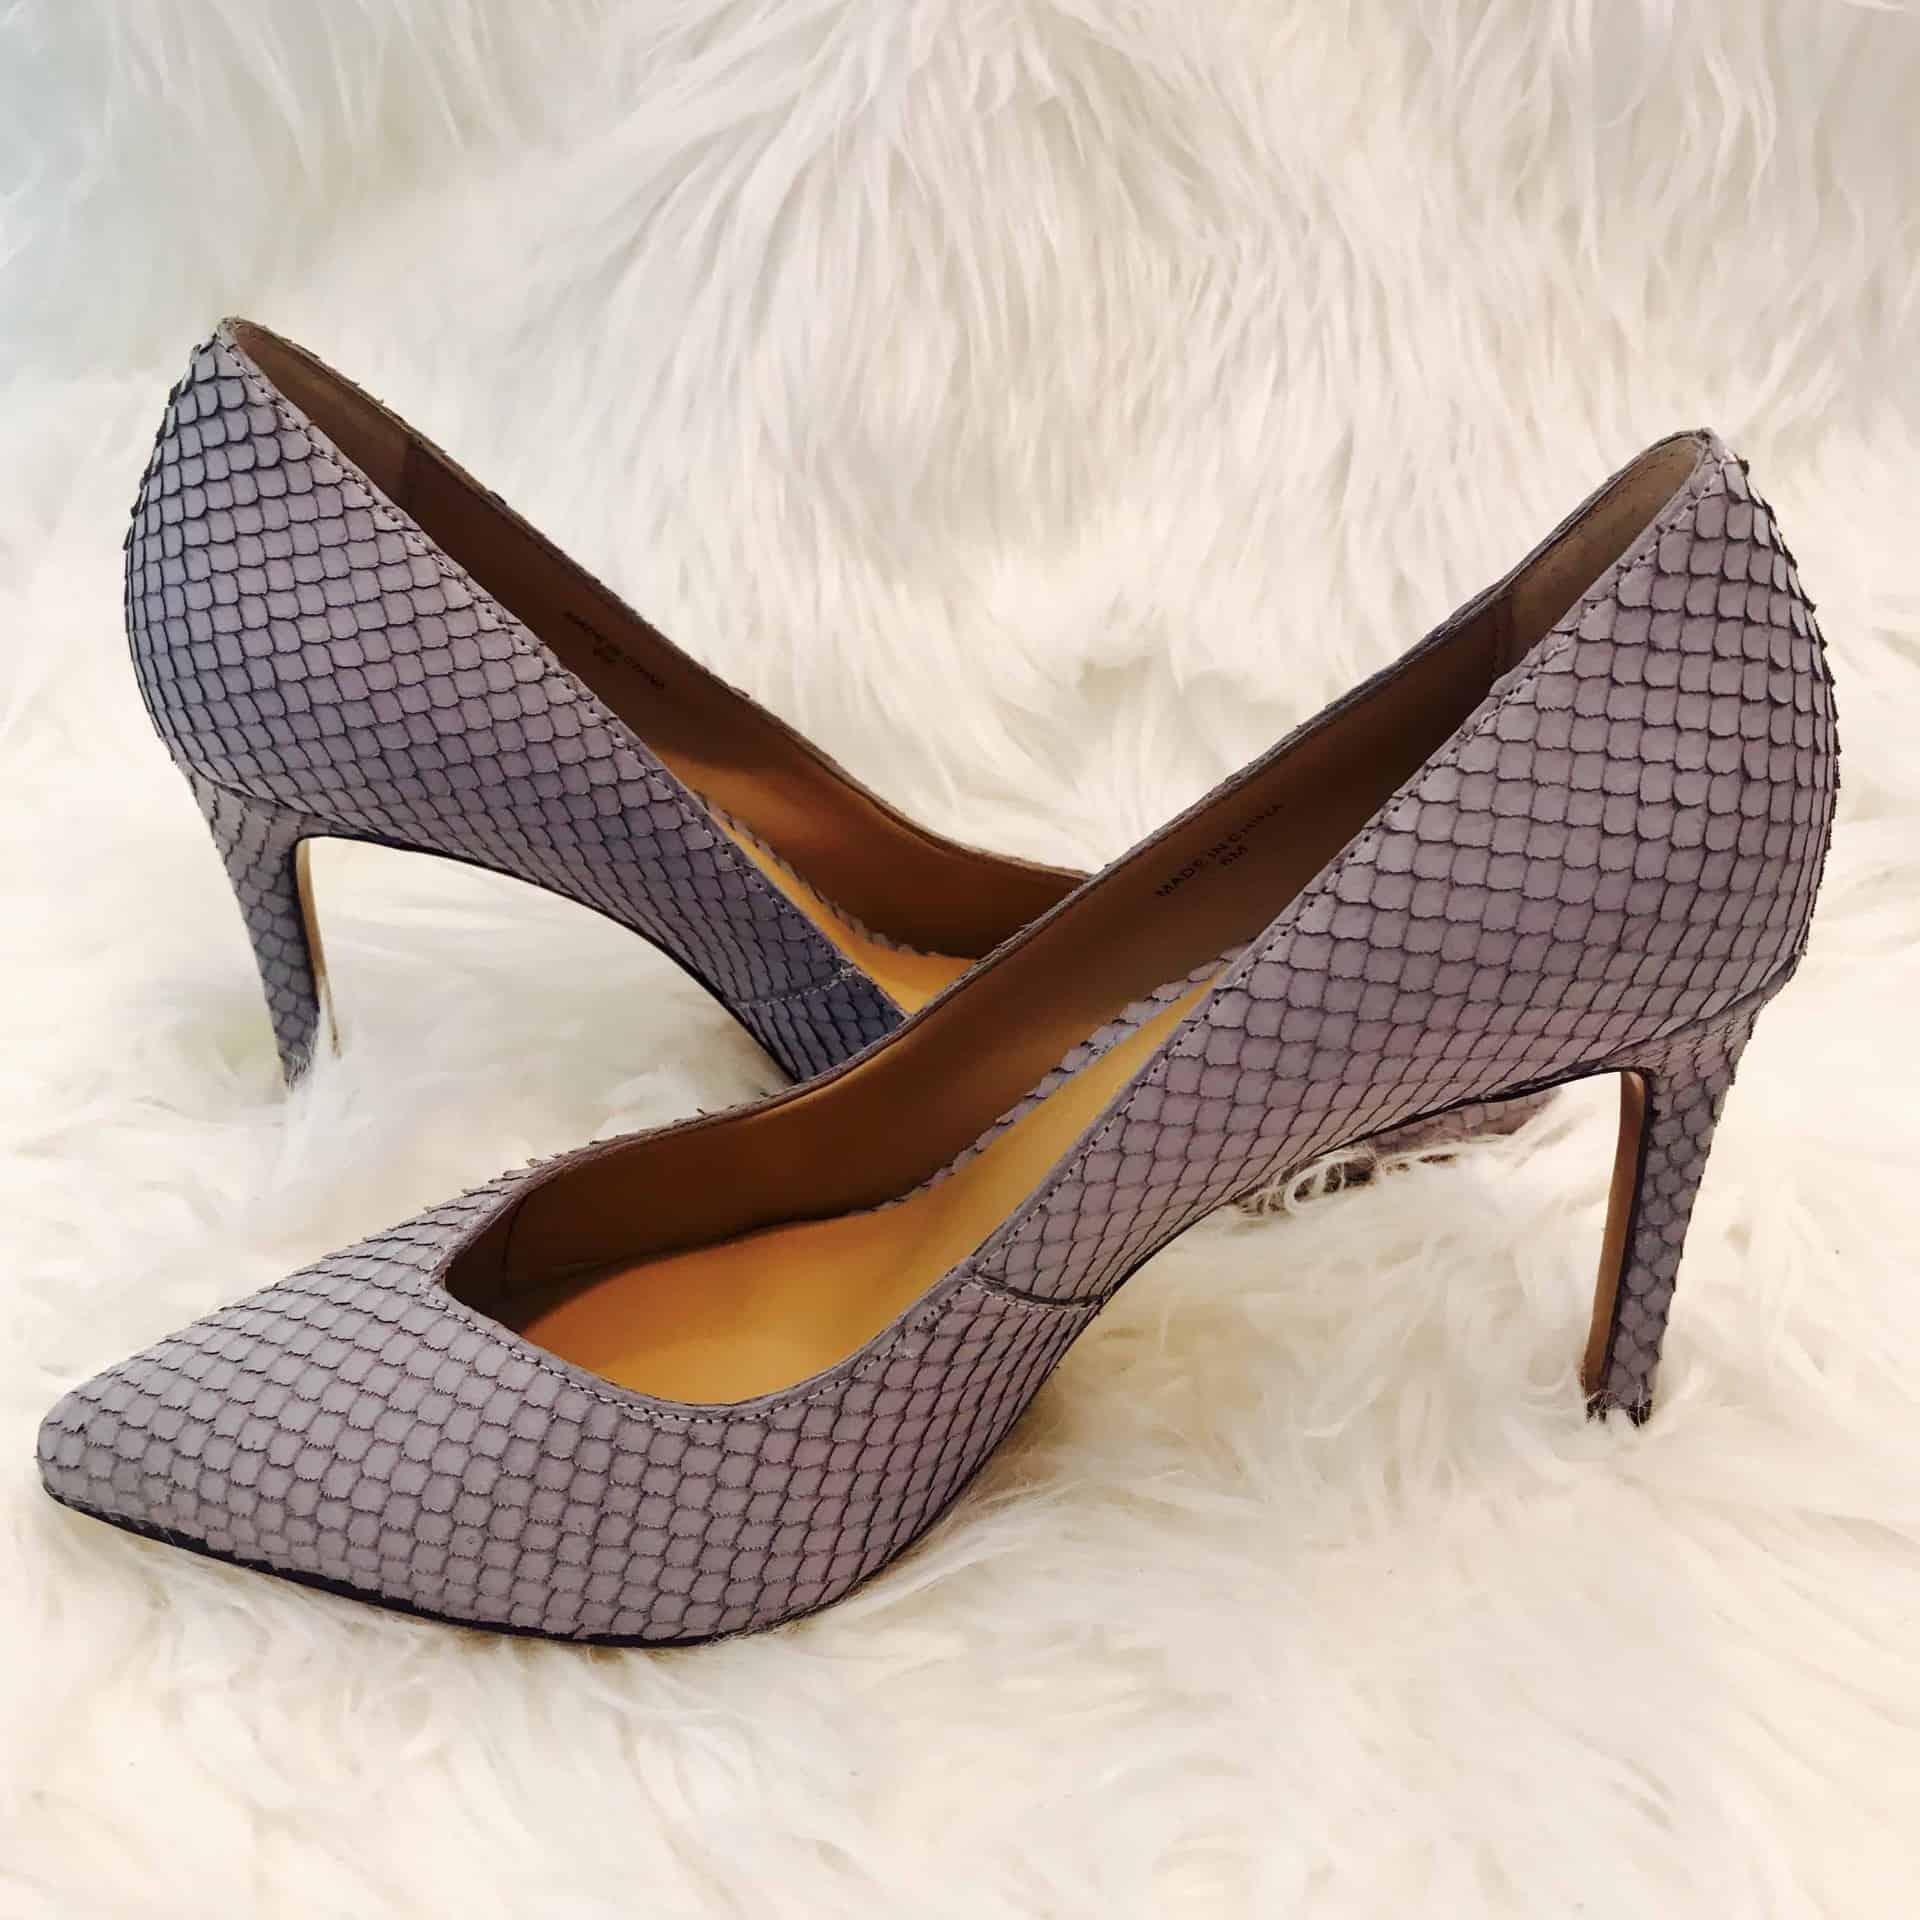 Leather pump high heels